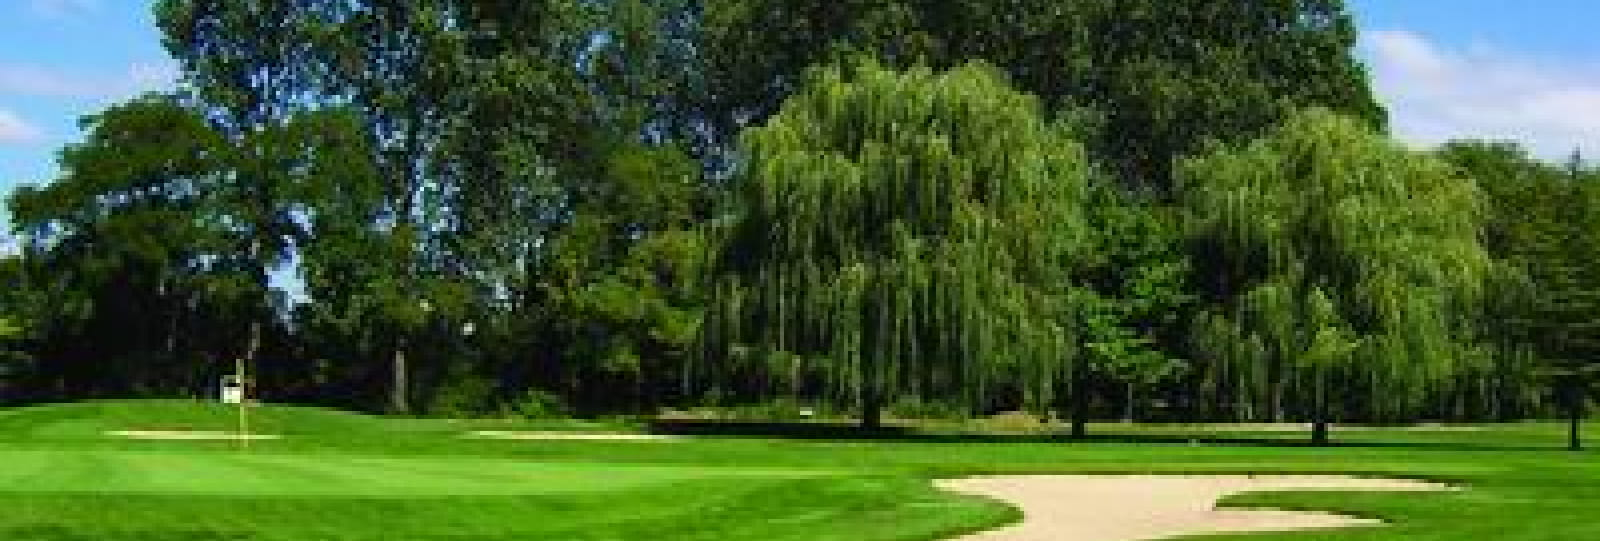 Golf Club de Valence Saint-Didier